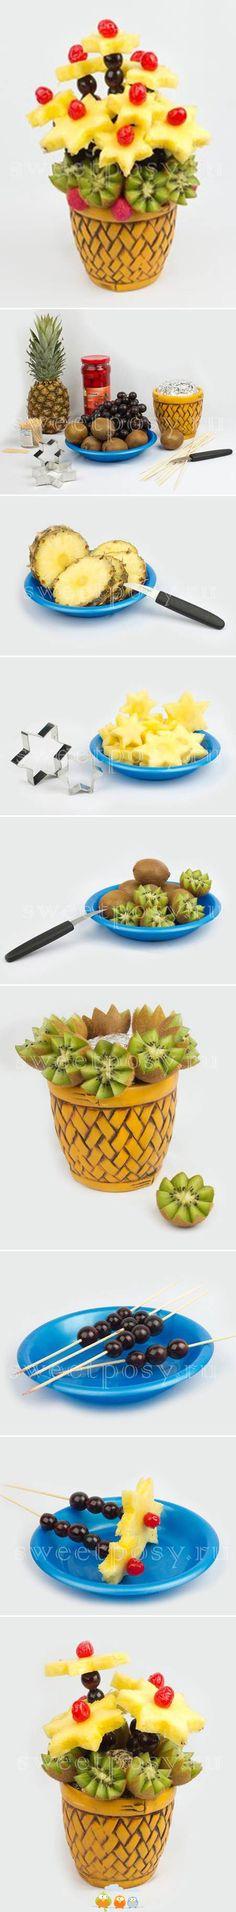 diy ideas, diy crafts, diy tutorial, food art, craft ideas, fruit basket, fruiti bouquet, diy projects, diy fruiti